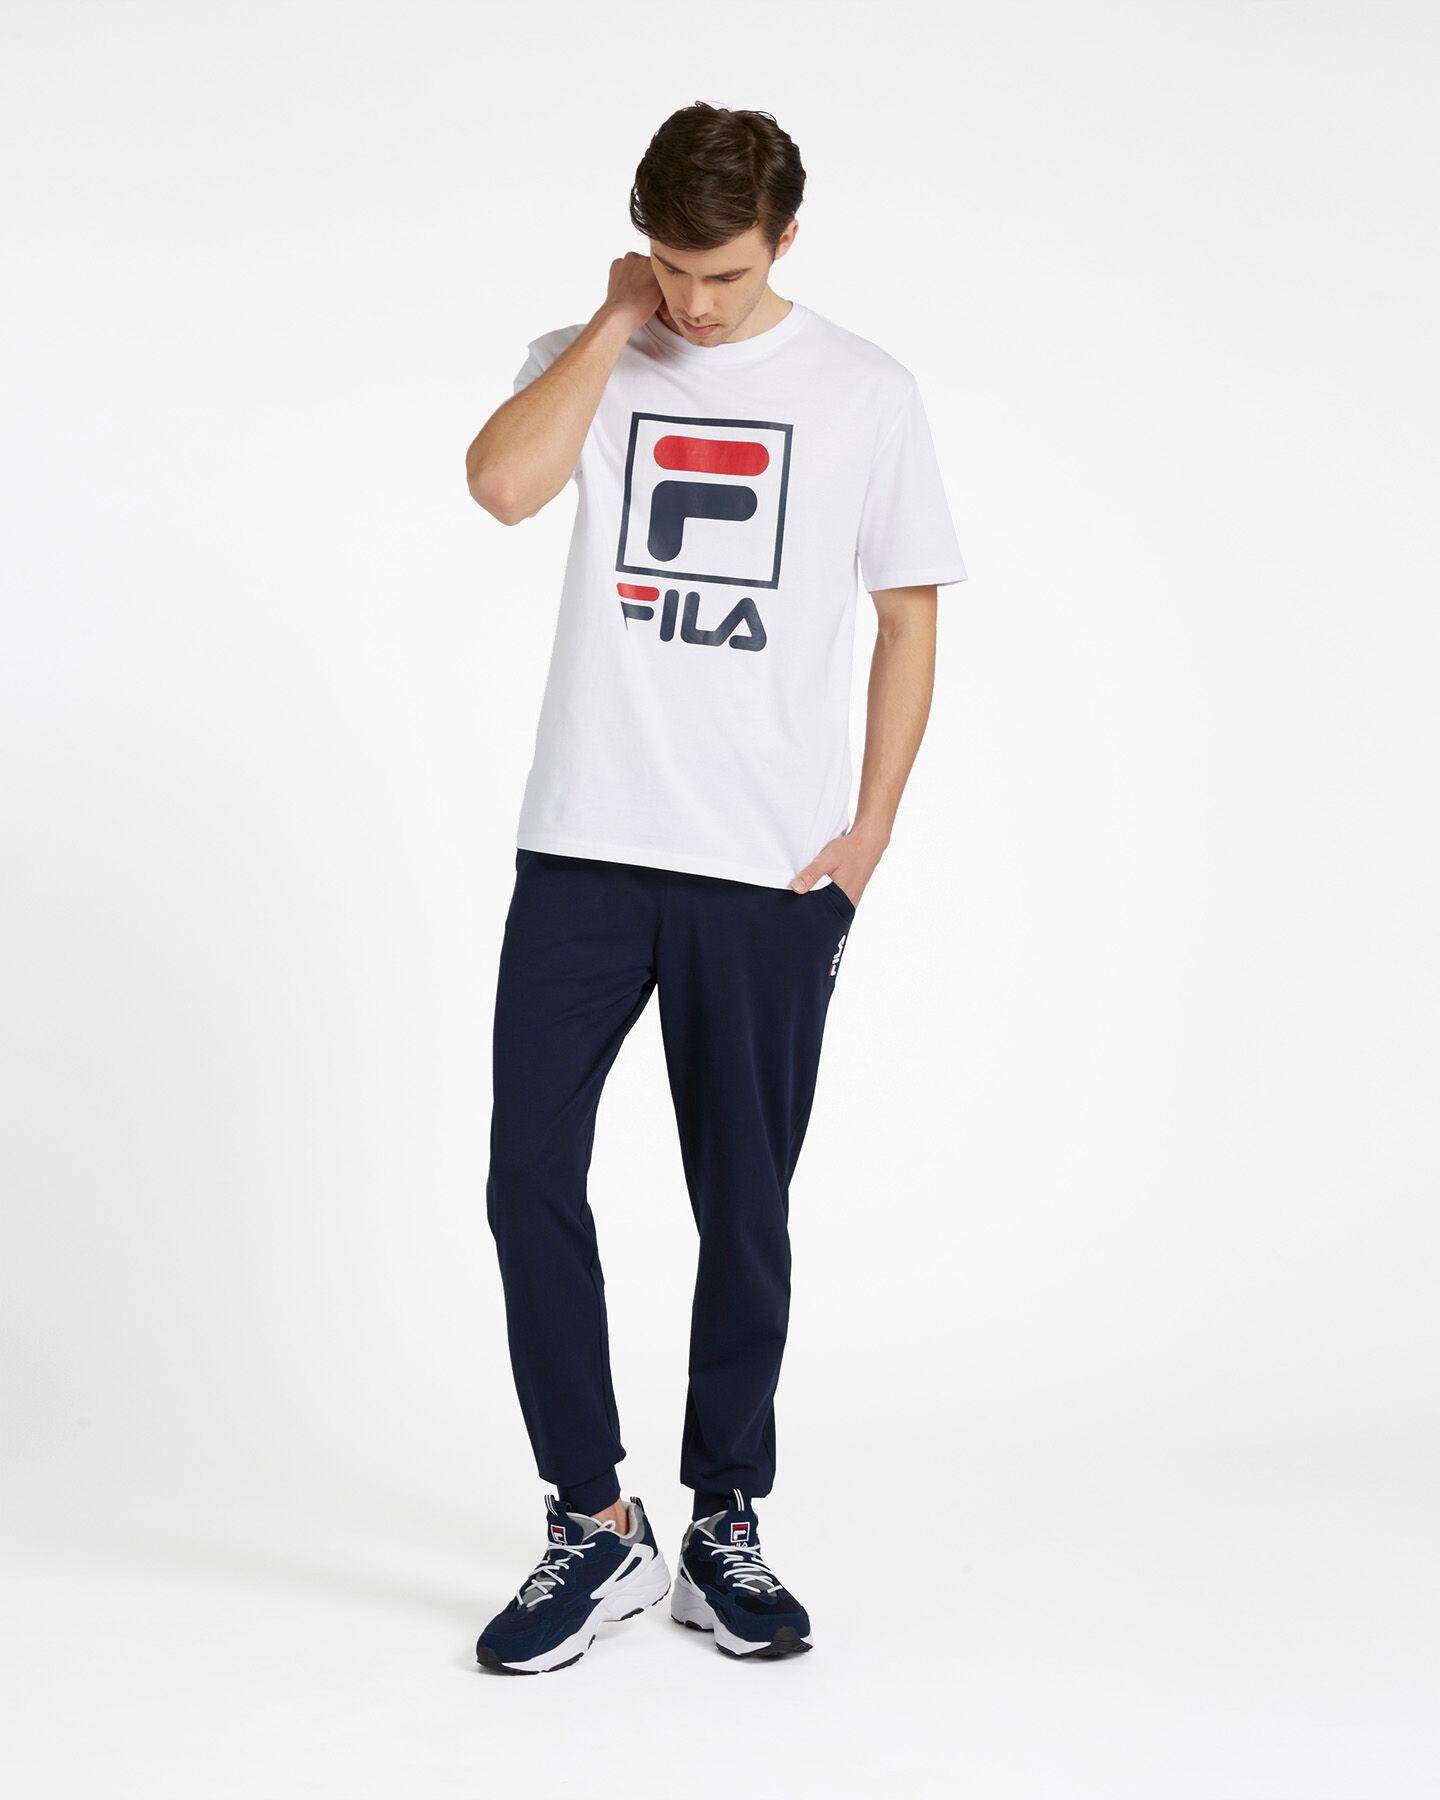 T-Shirt FILA LOGO VINTAGE M S4088402 scatto 1